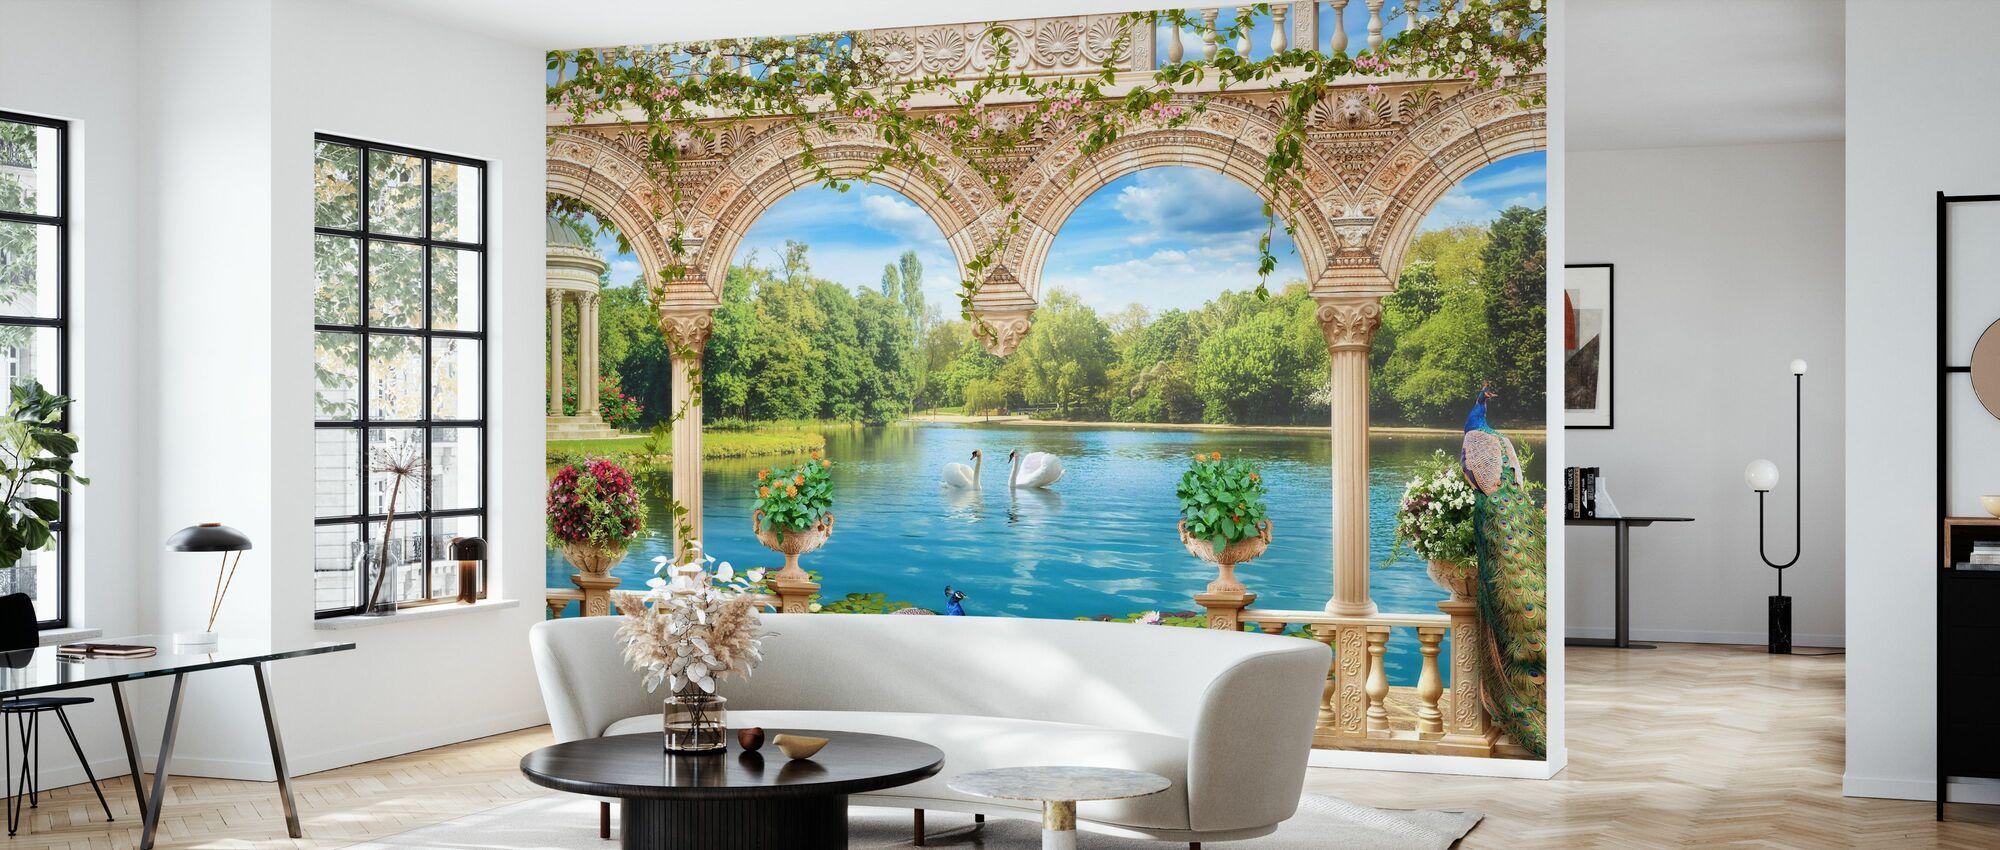 Swans in Park - Wallpaper - Living Room